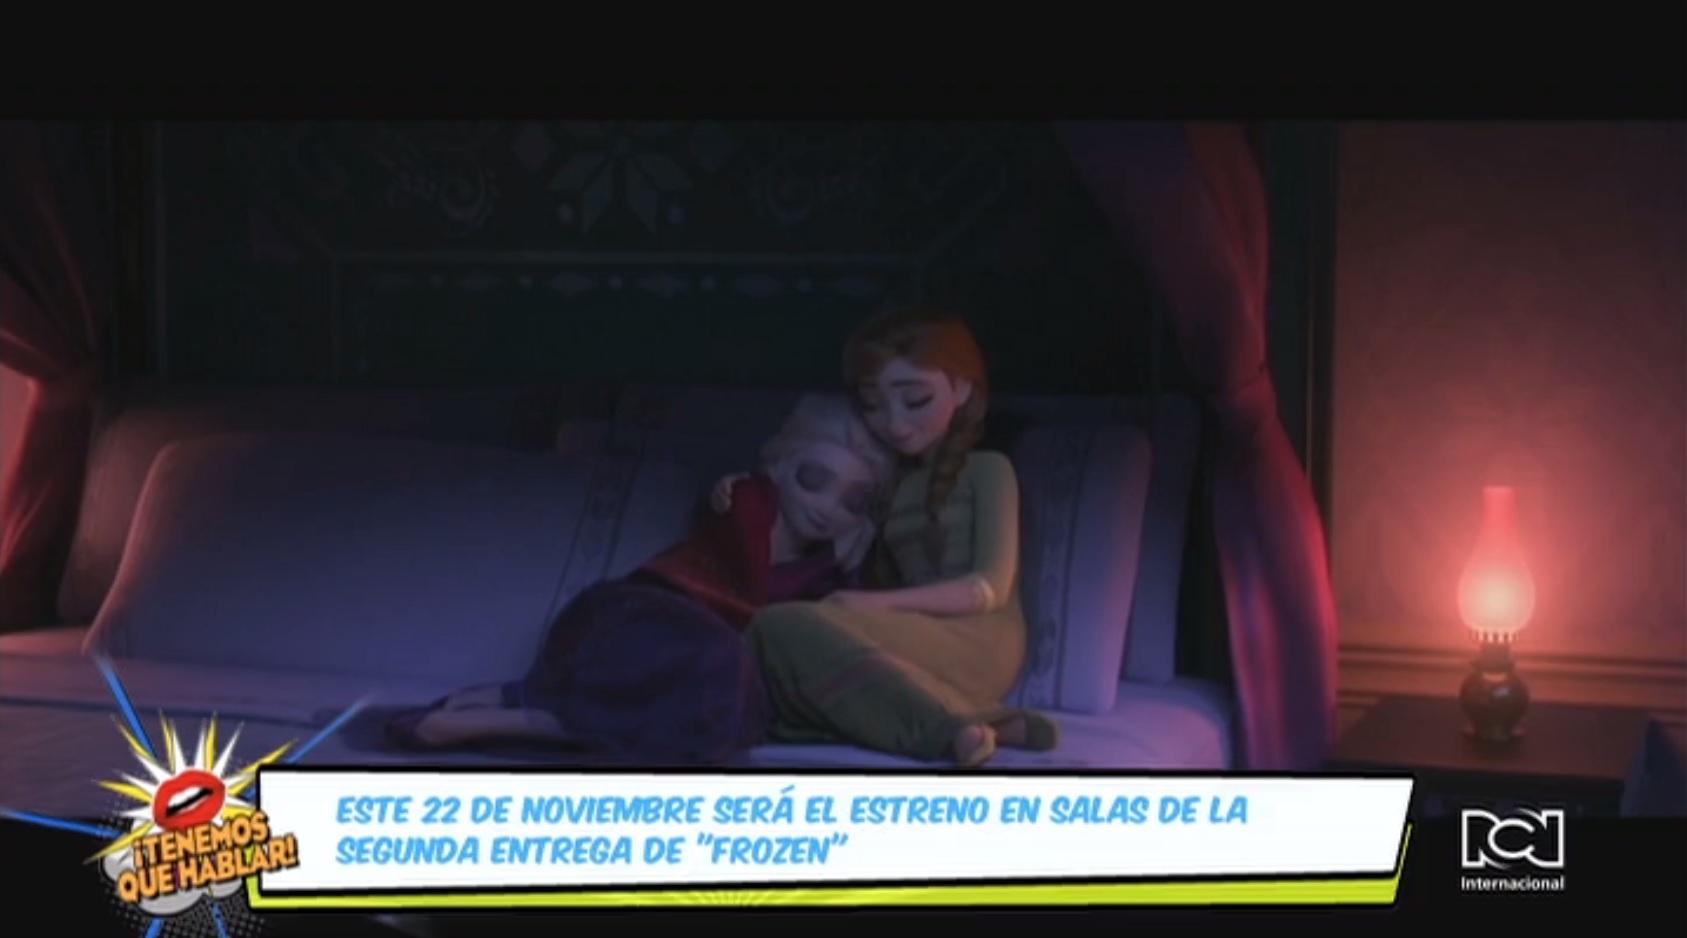 'Frozen 2' llegará a salas de cine este 22 de noviembre